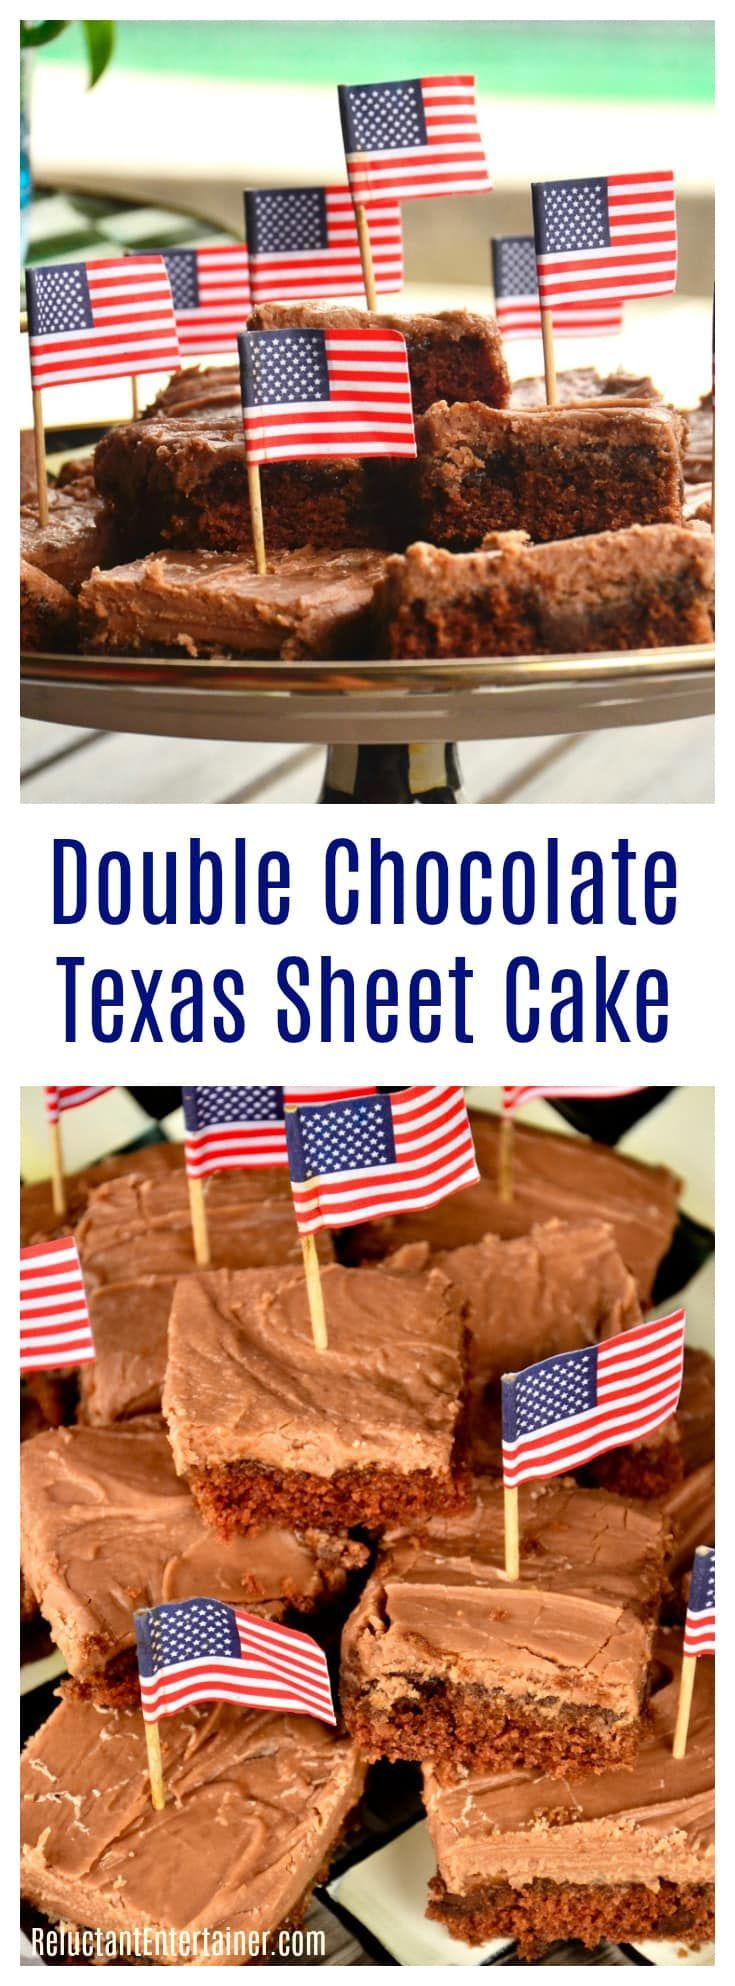 Double Chocolate Texas Sheet Cake